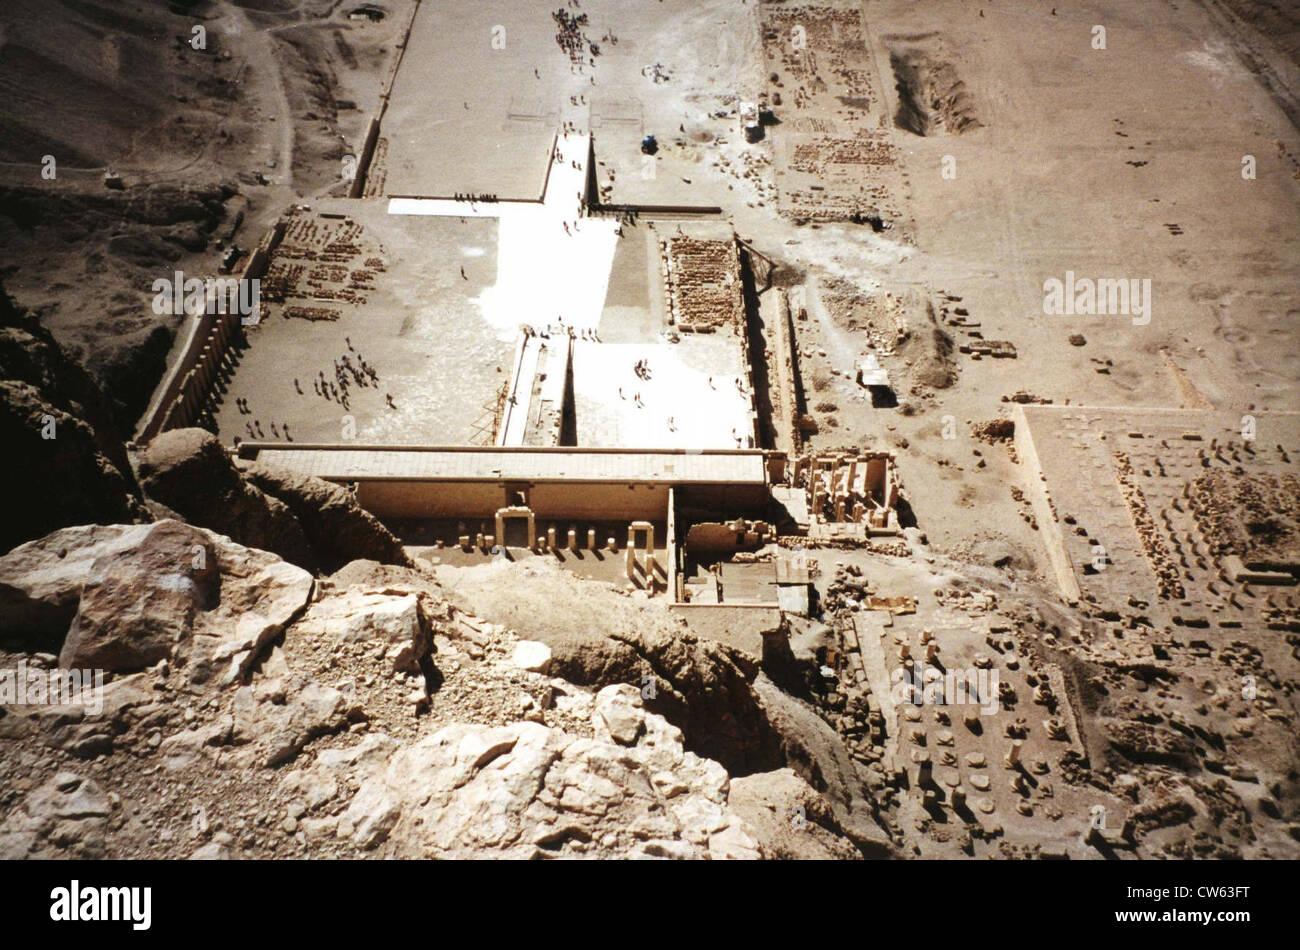 Dayr al Madinah site - Stock Image